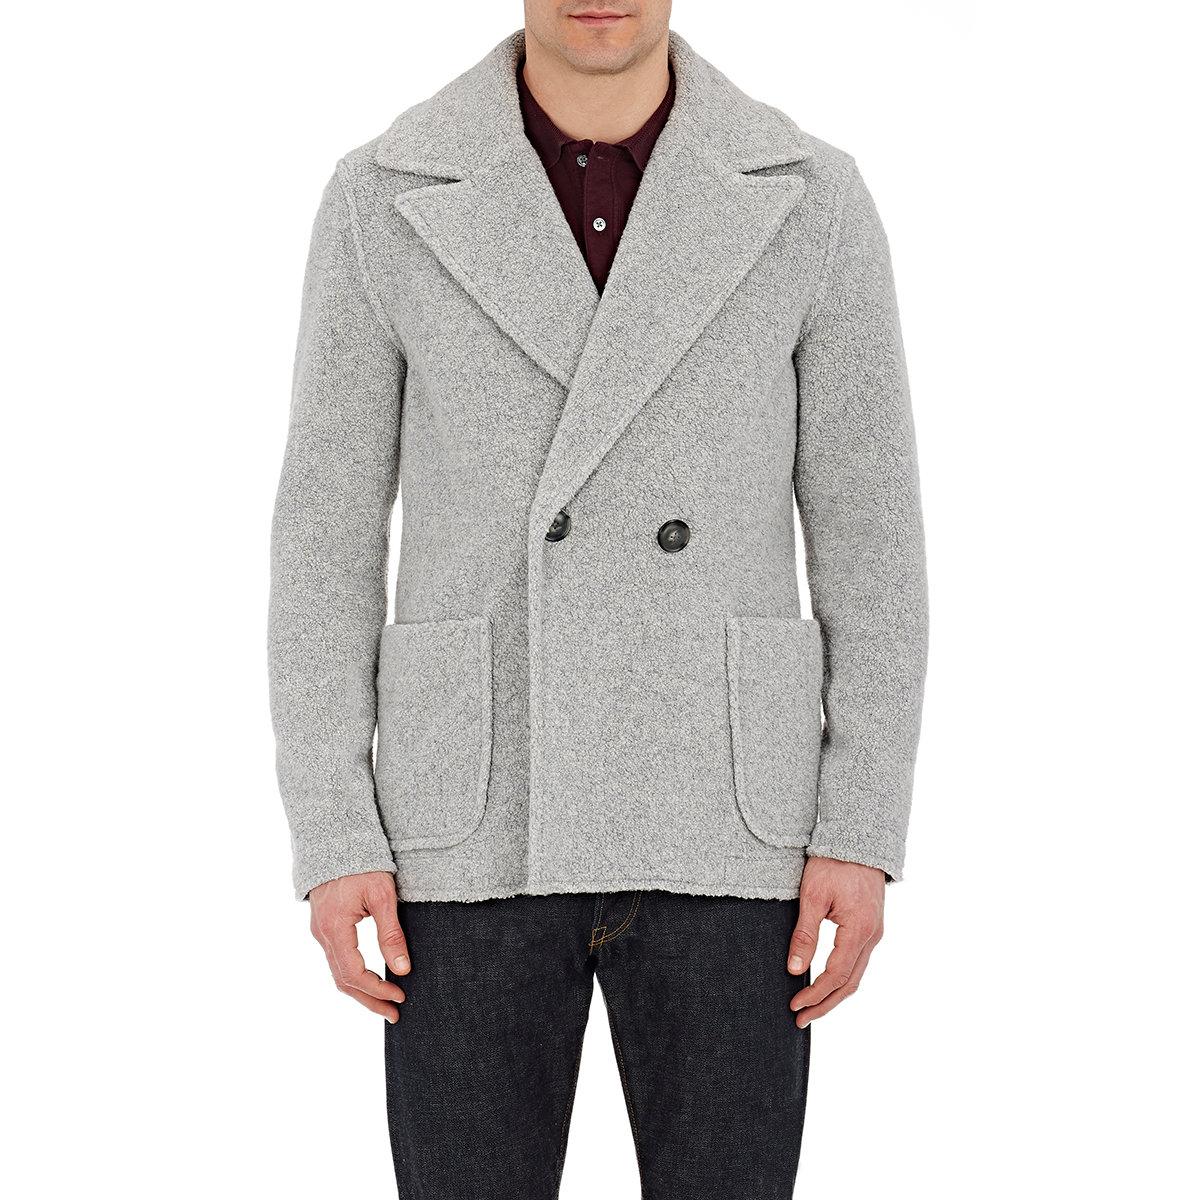 Atm Faux-shearling Coat in Gray for Men